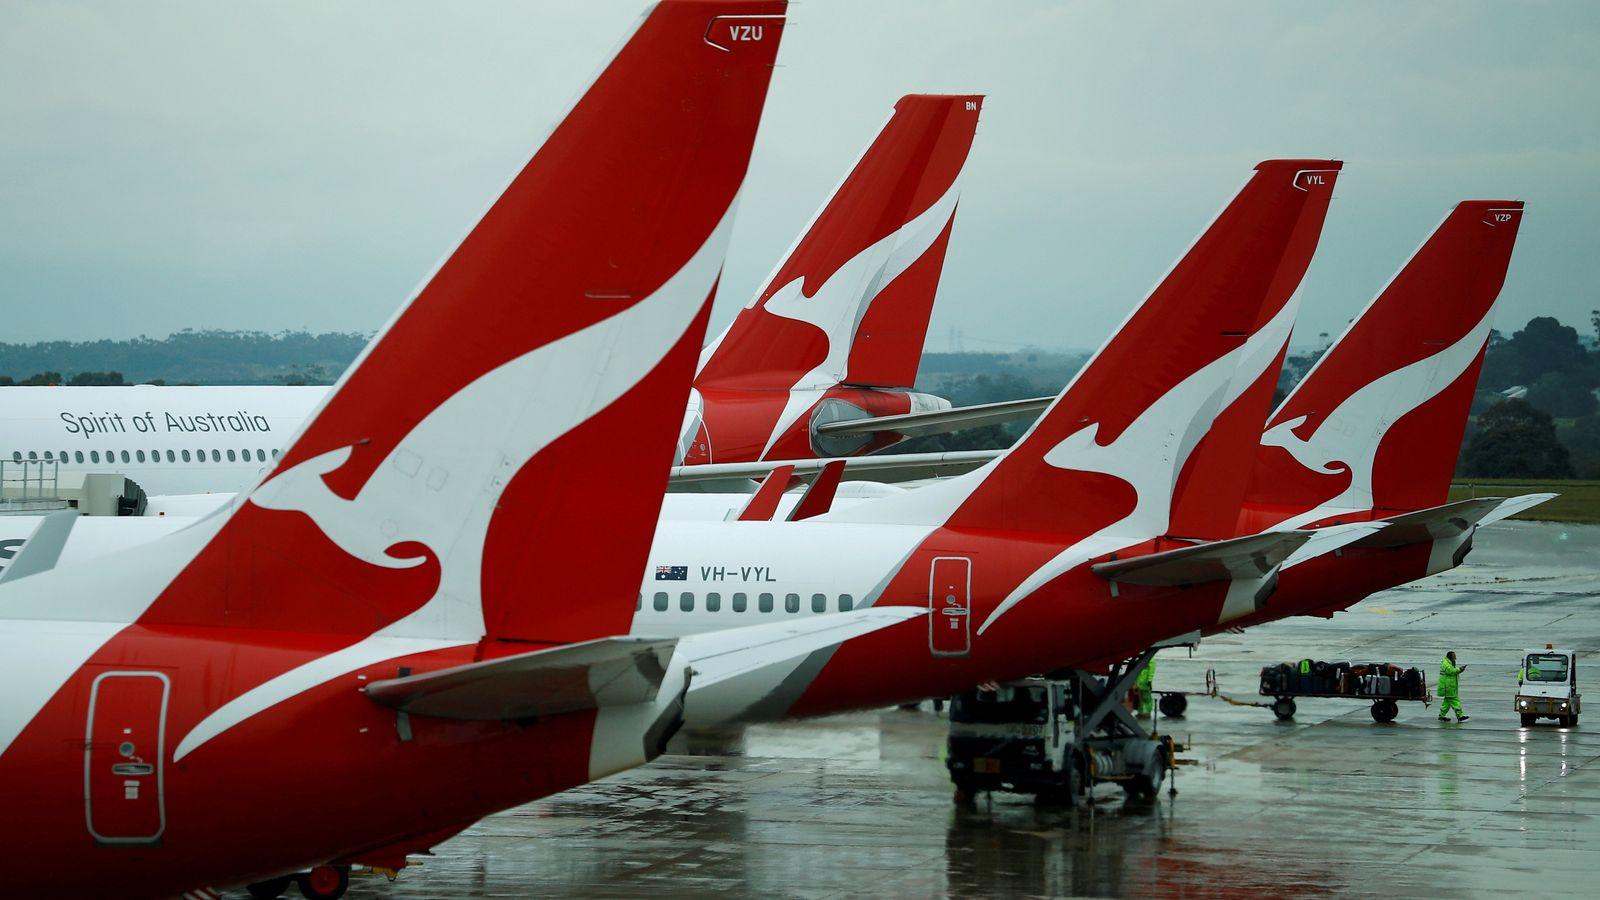 skynews-australia-travel_5474218.jpg?202